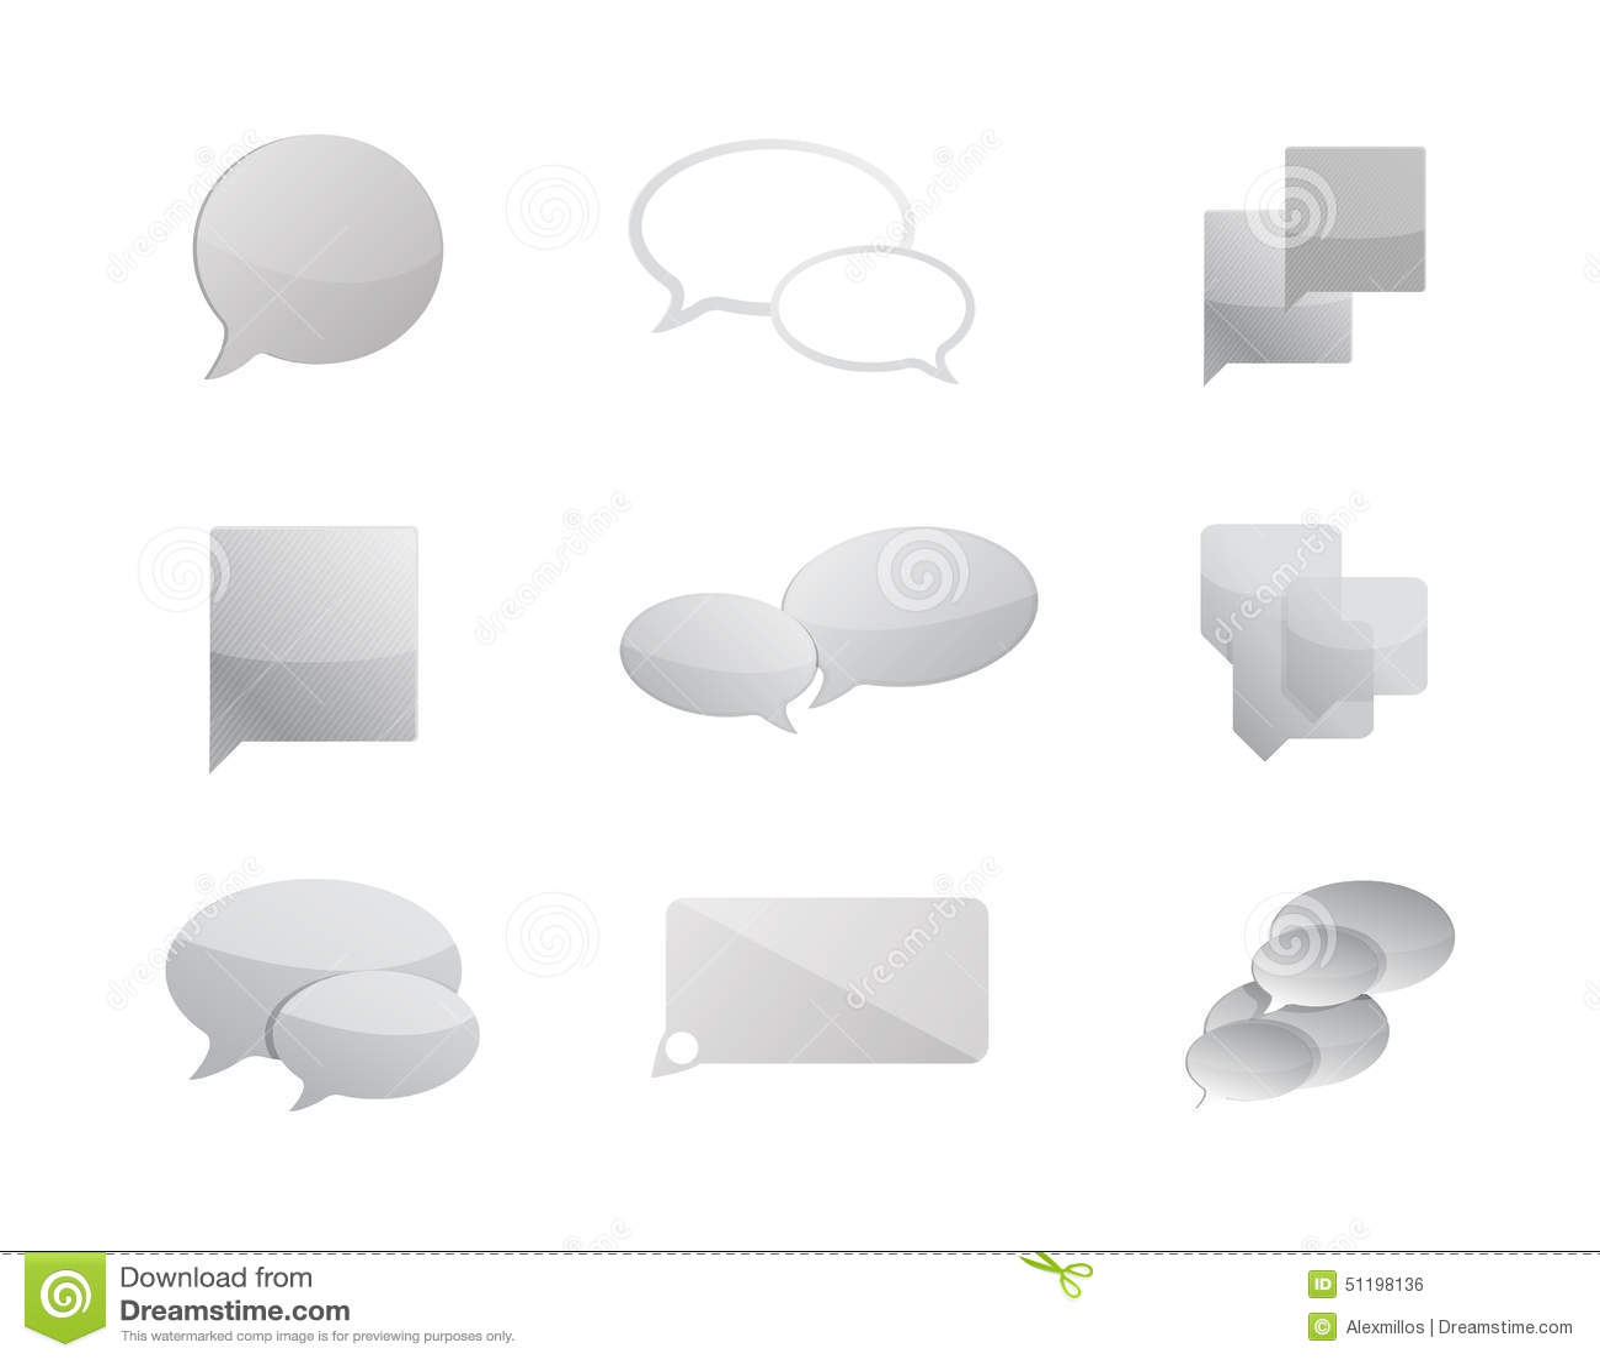 communication bubbles icon set illustration design